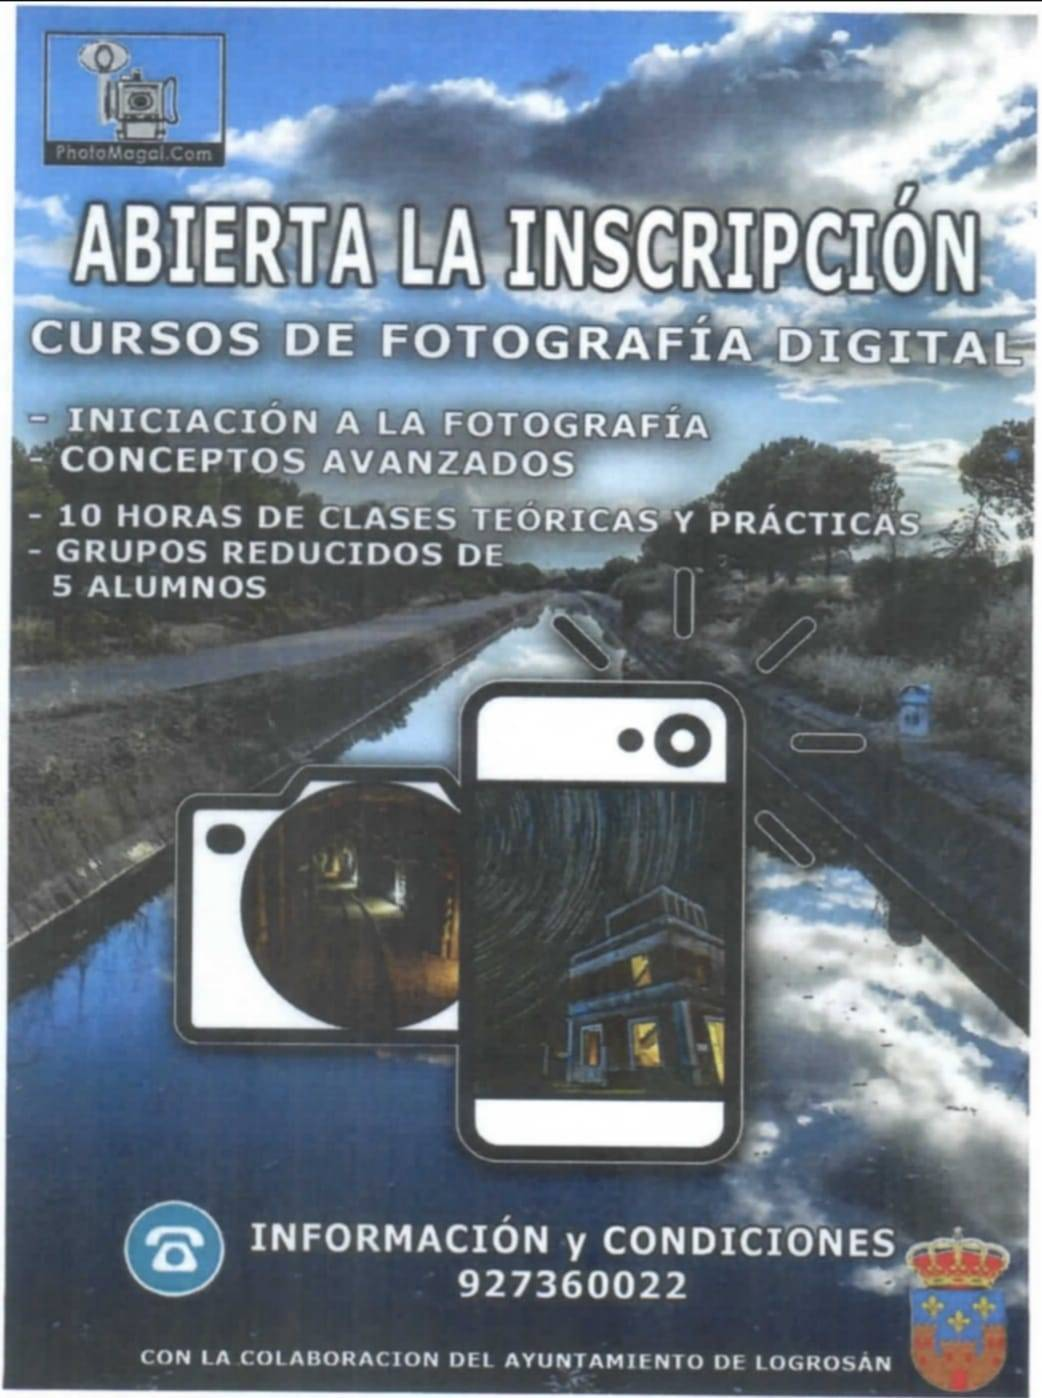 Curso de fotografía digital (2021) - Logrosán (Cáceres)